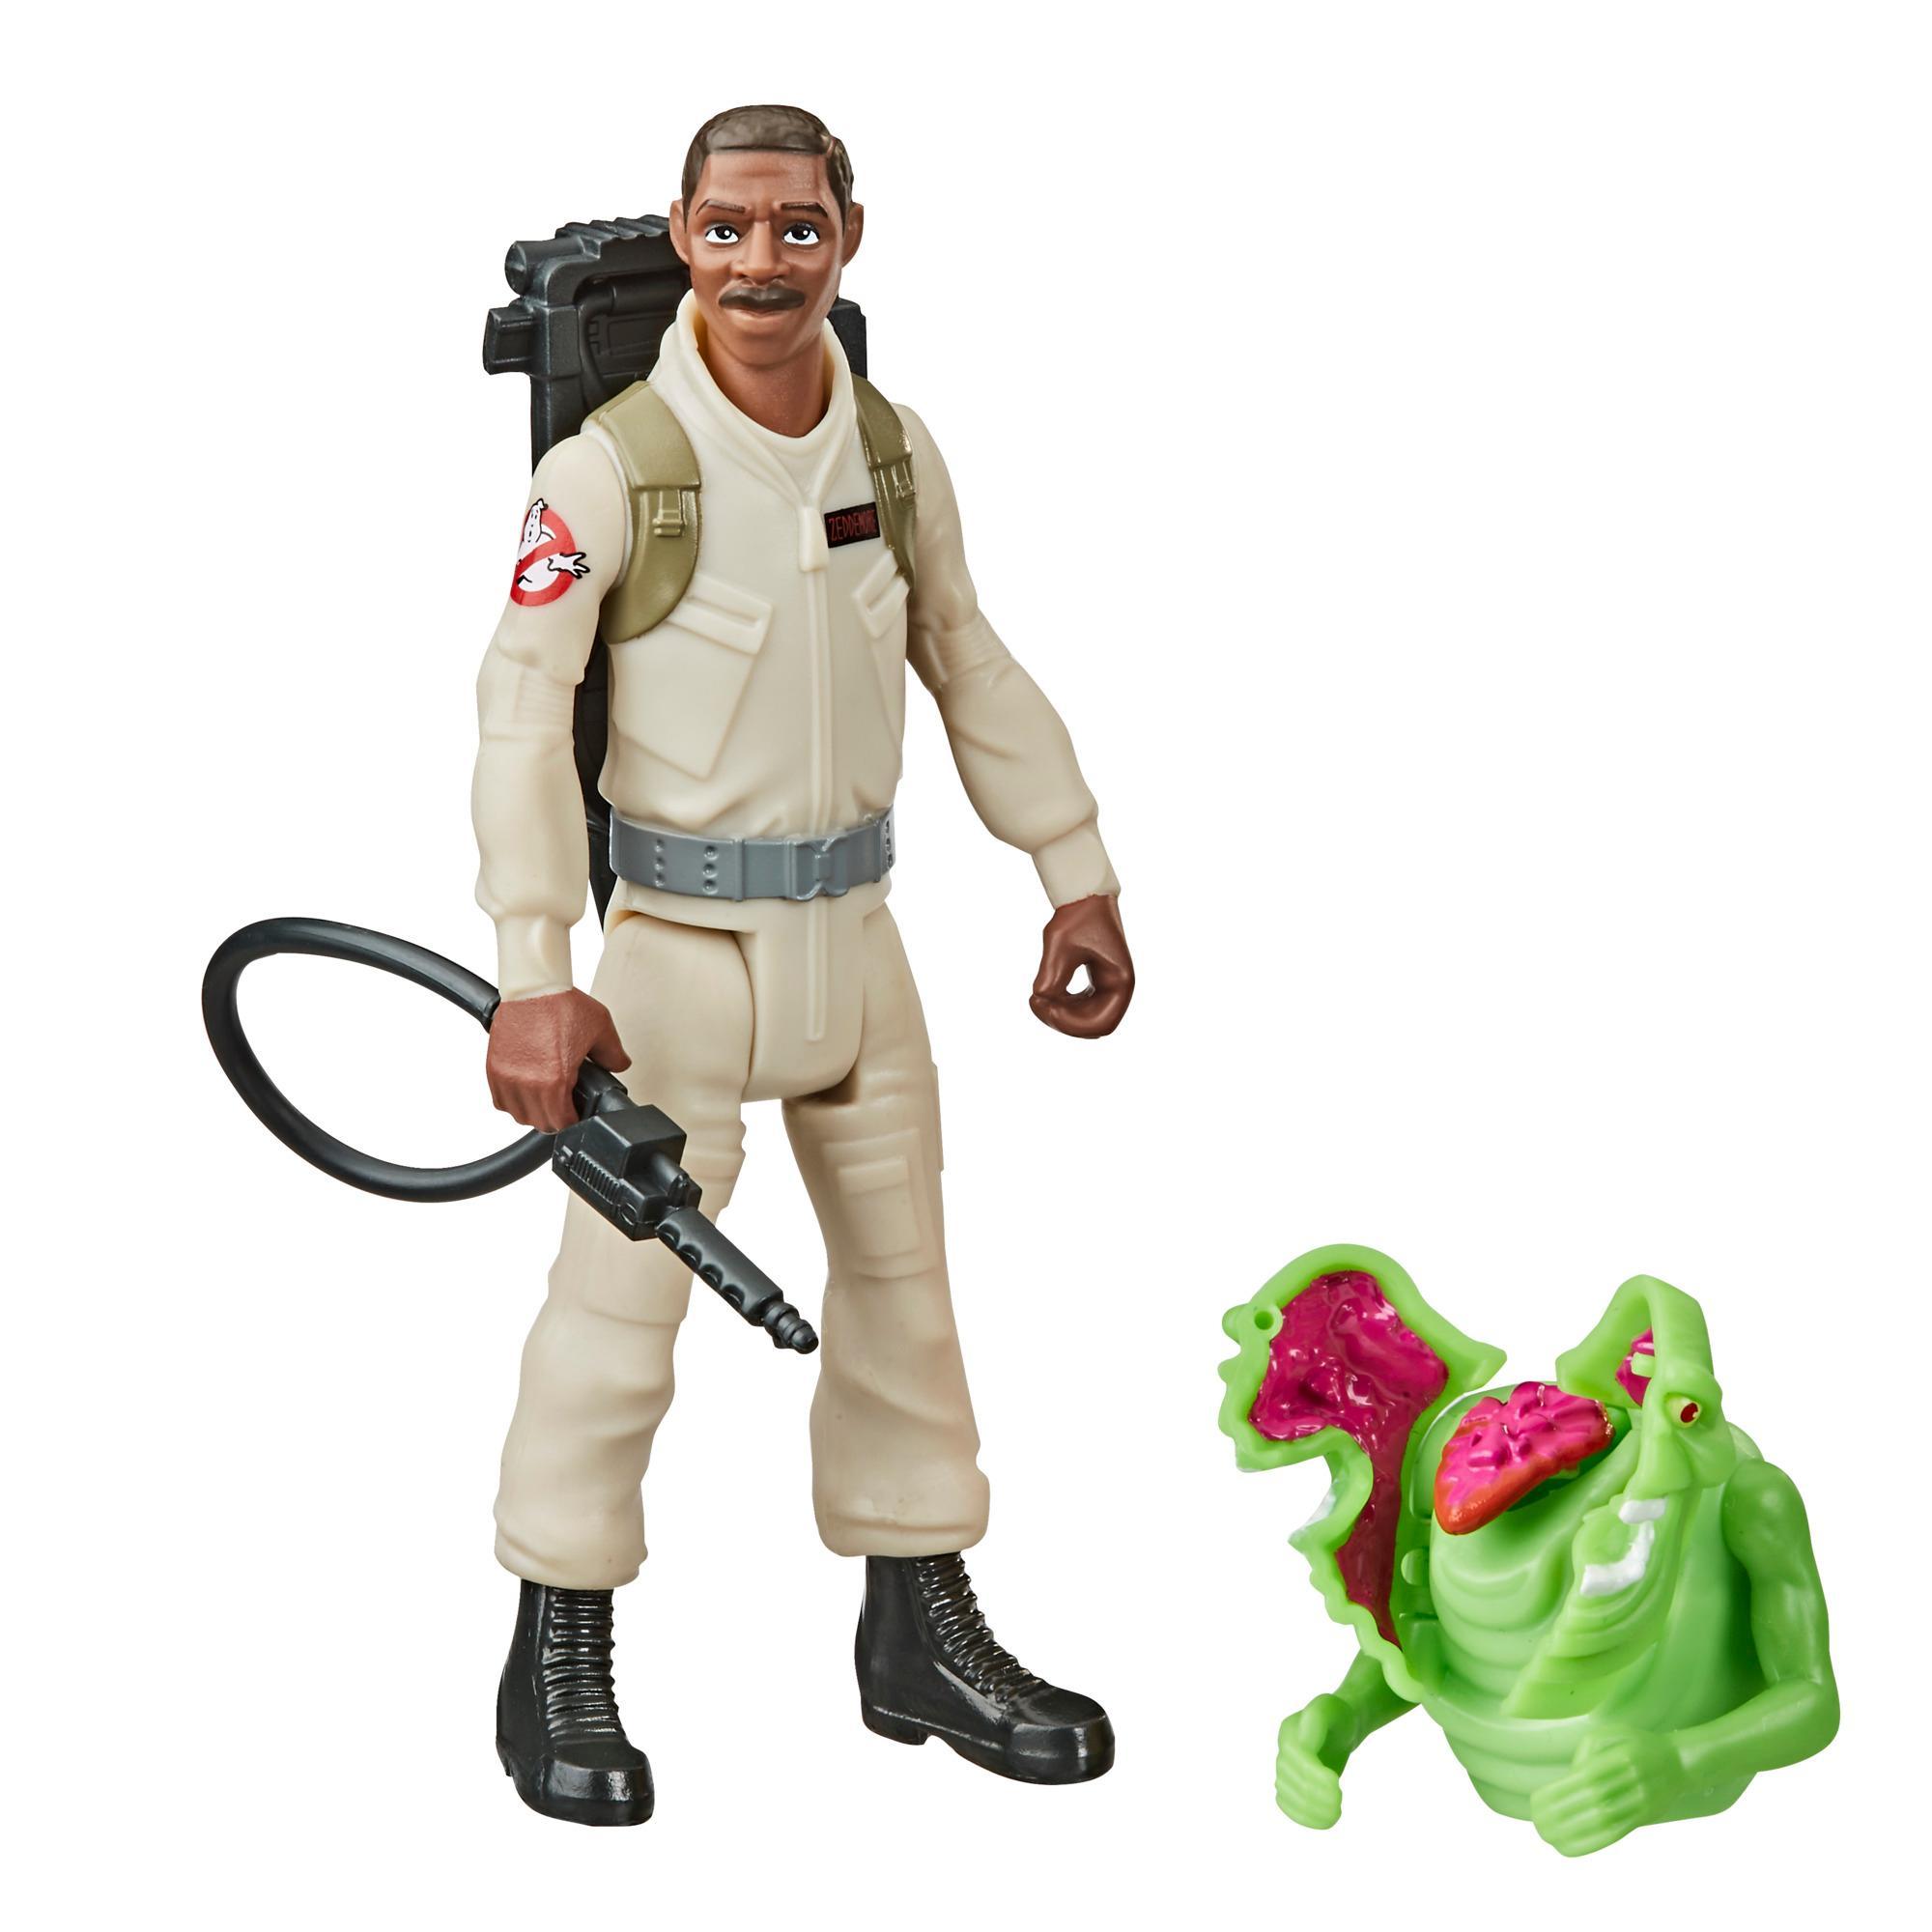 Os Caça Fantasmas Winstone Zeddemor Ghostbusters Hasbro